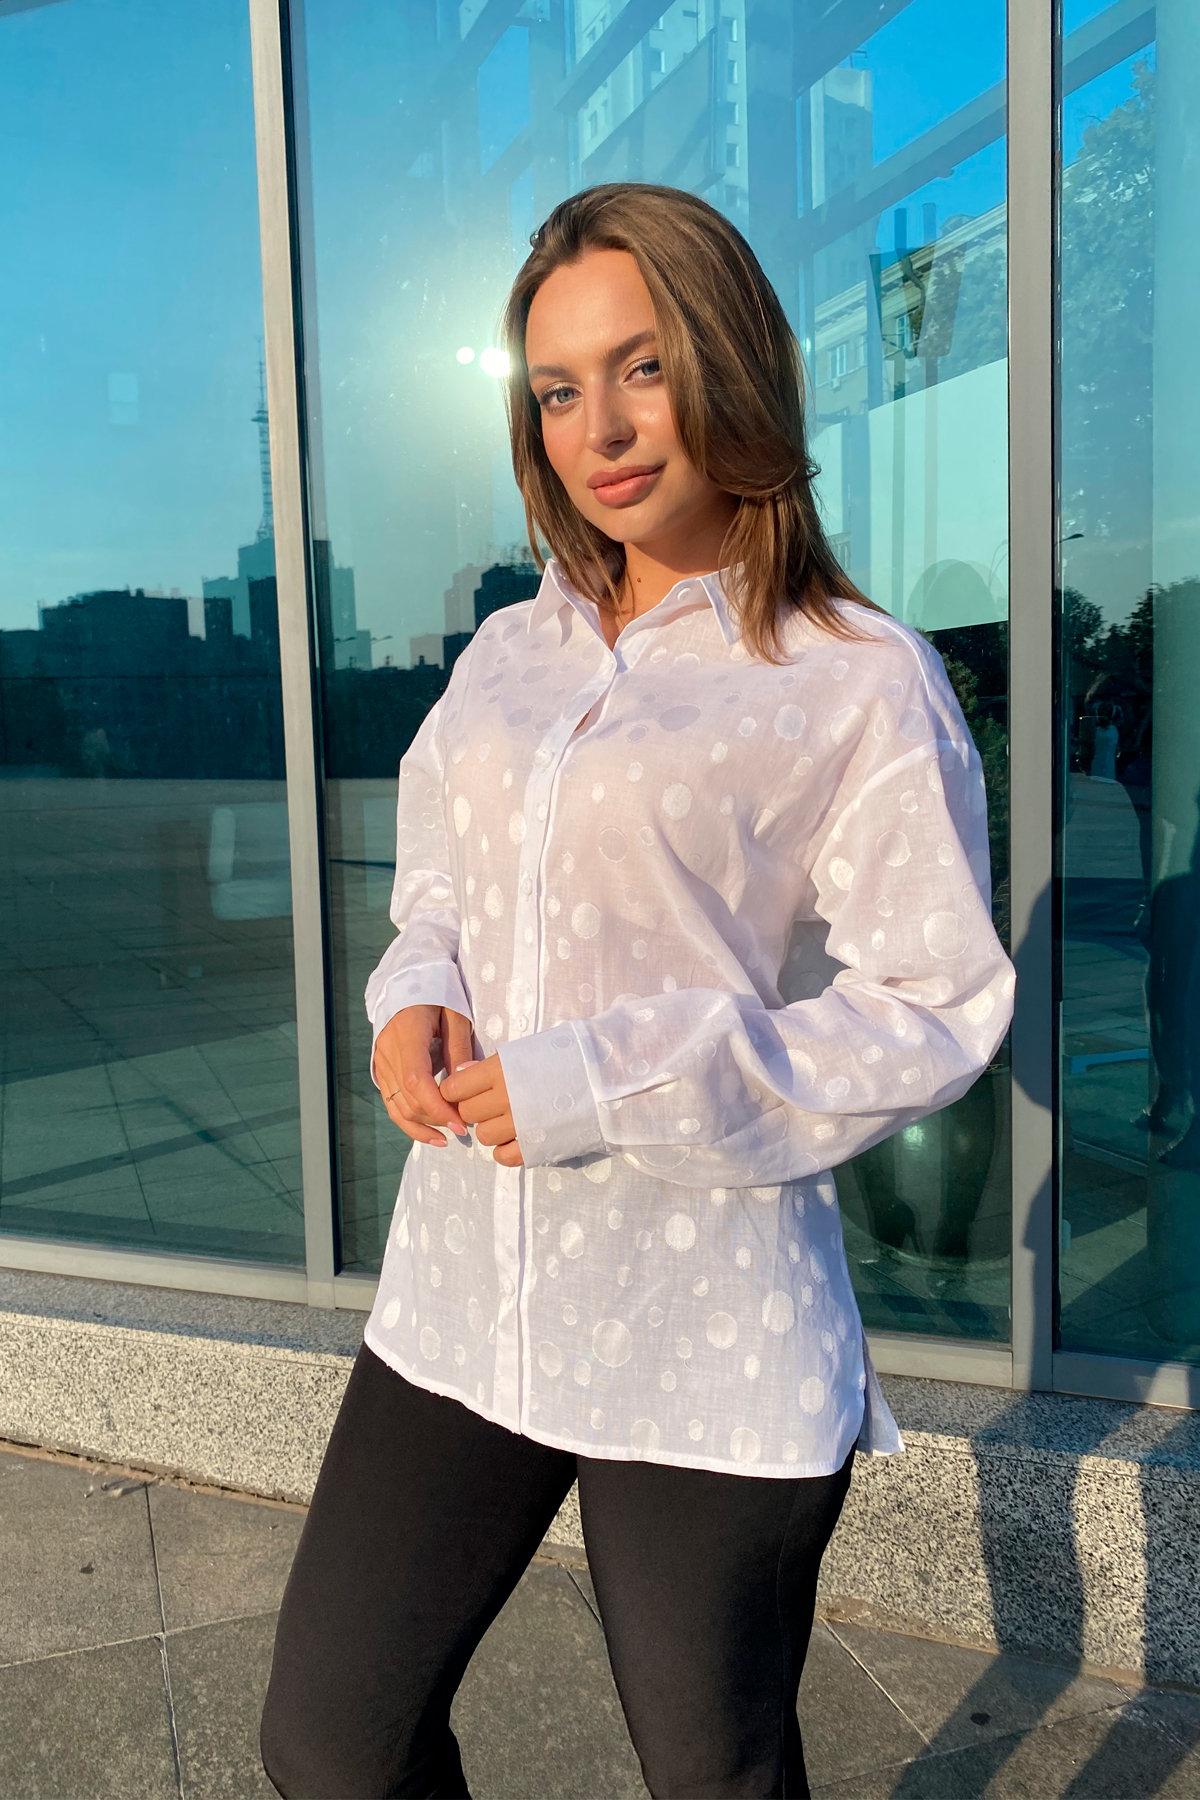 Блуза Эйплс 96242 АРТ. 45930 Цвет: Белый - фото 3, интернет магазин tm-modus.ru